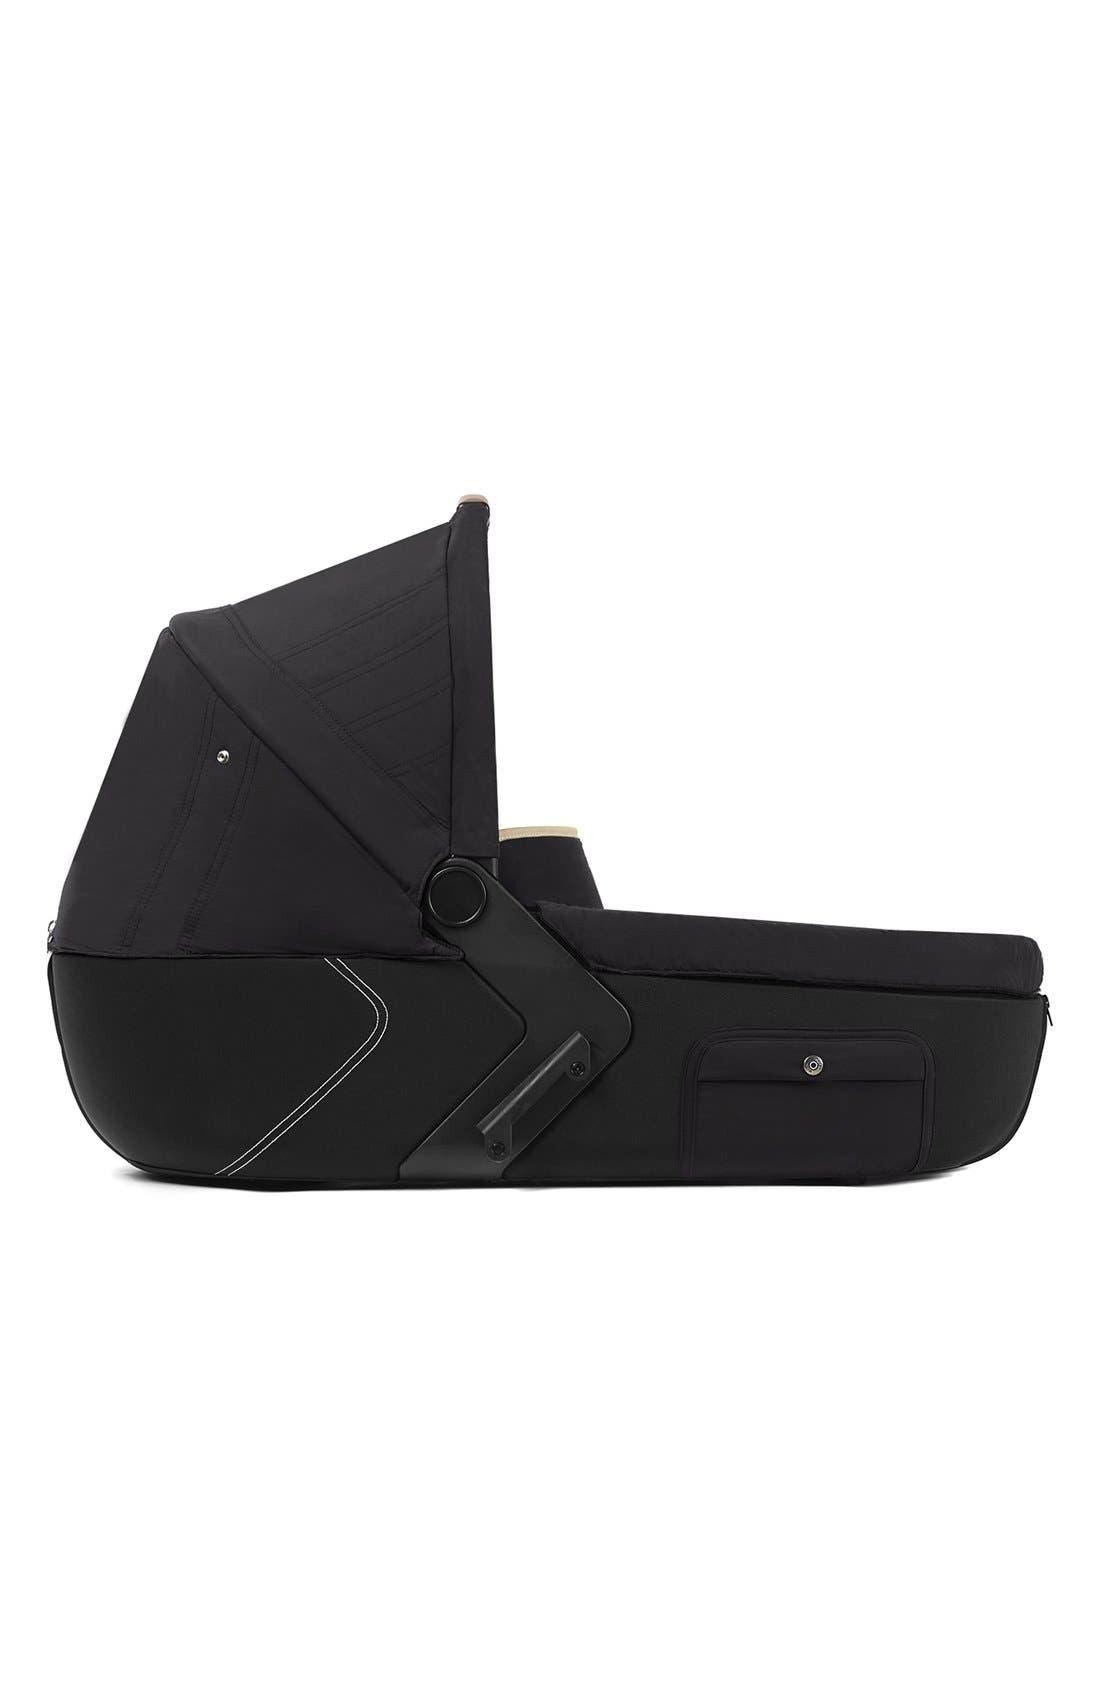 'Igo - Reflect Cosmo Black' Bassinet,                         Main,                         color, Black